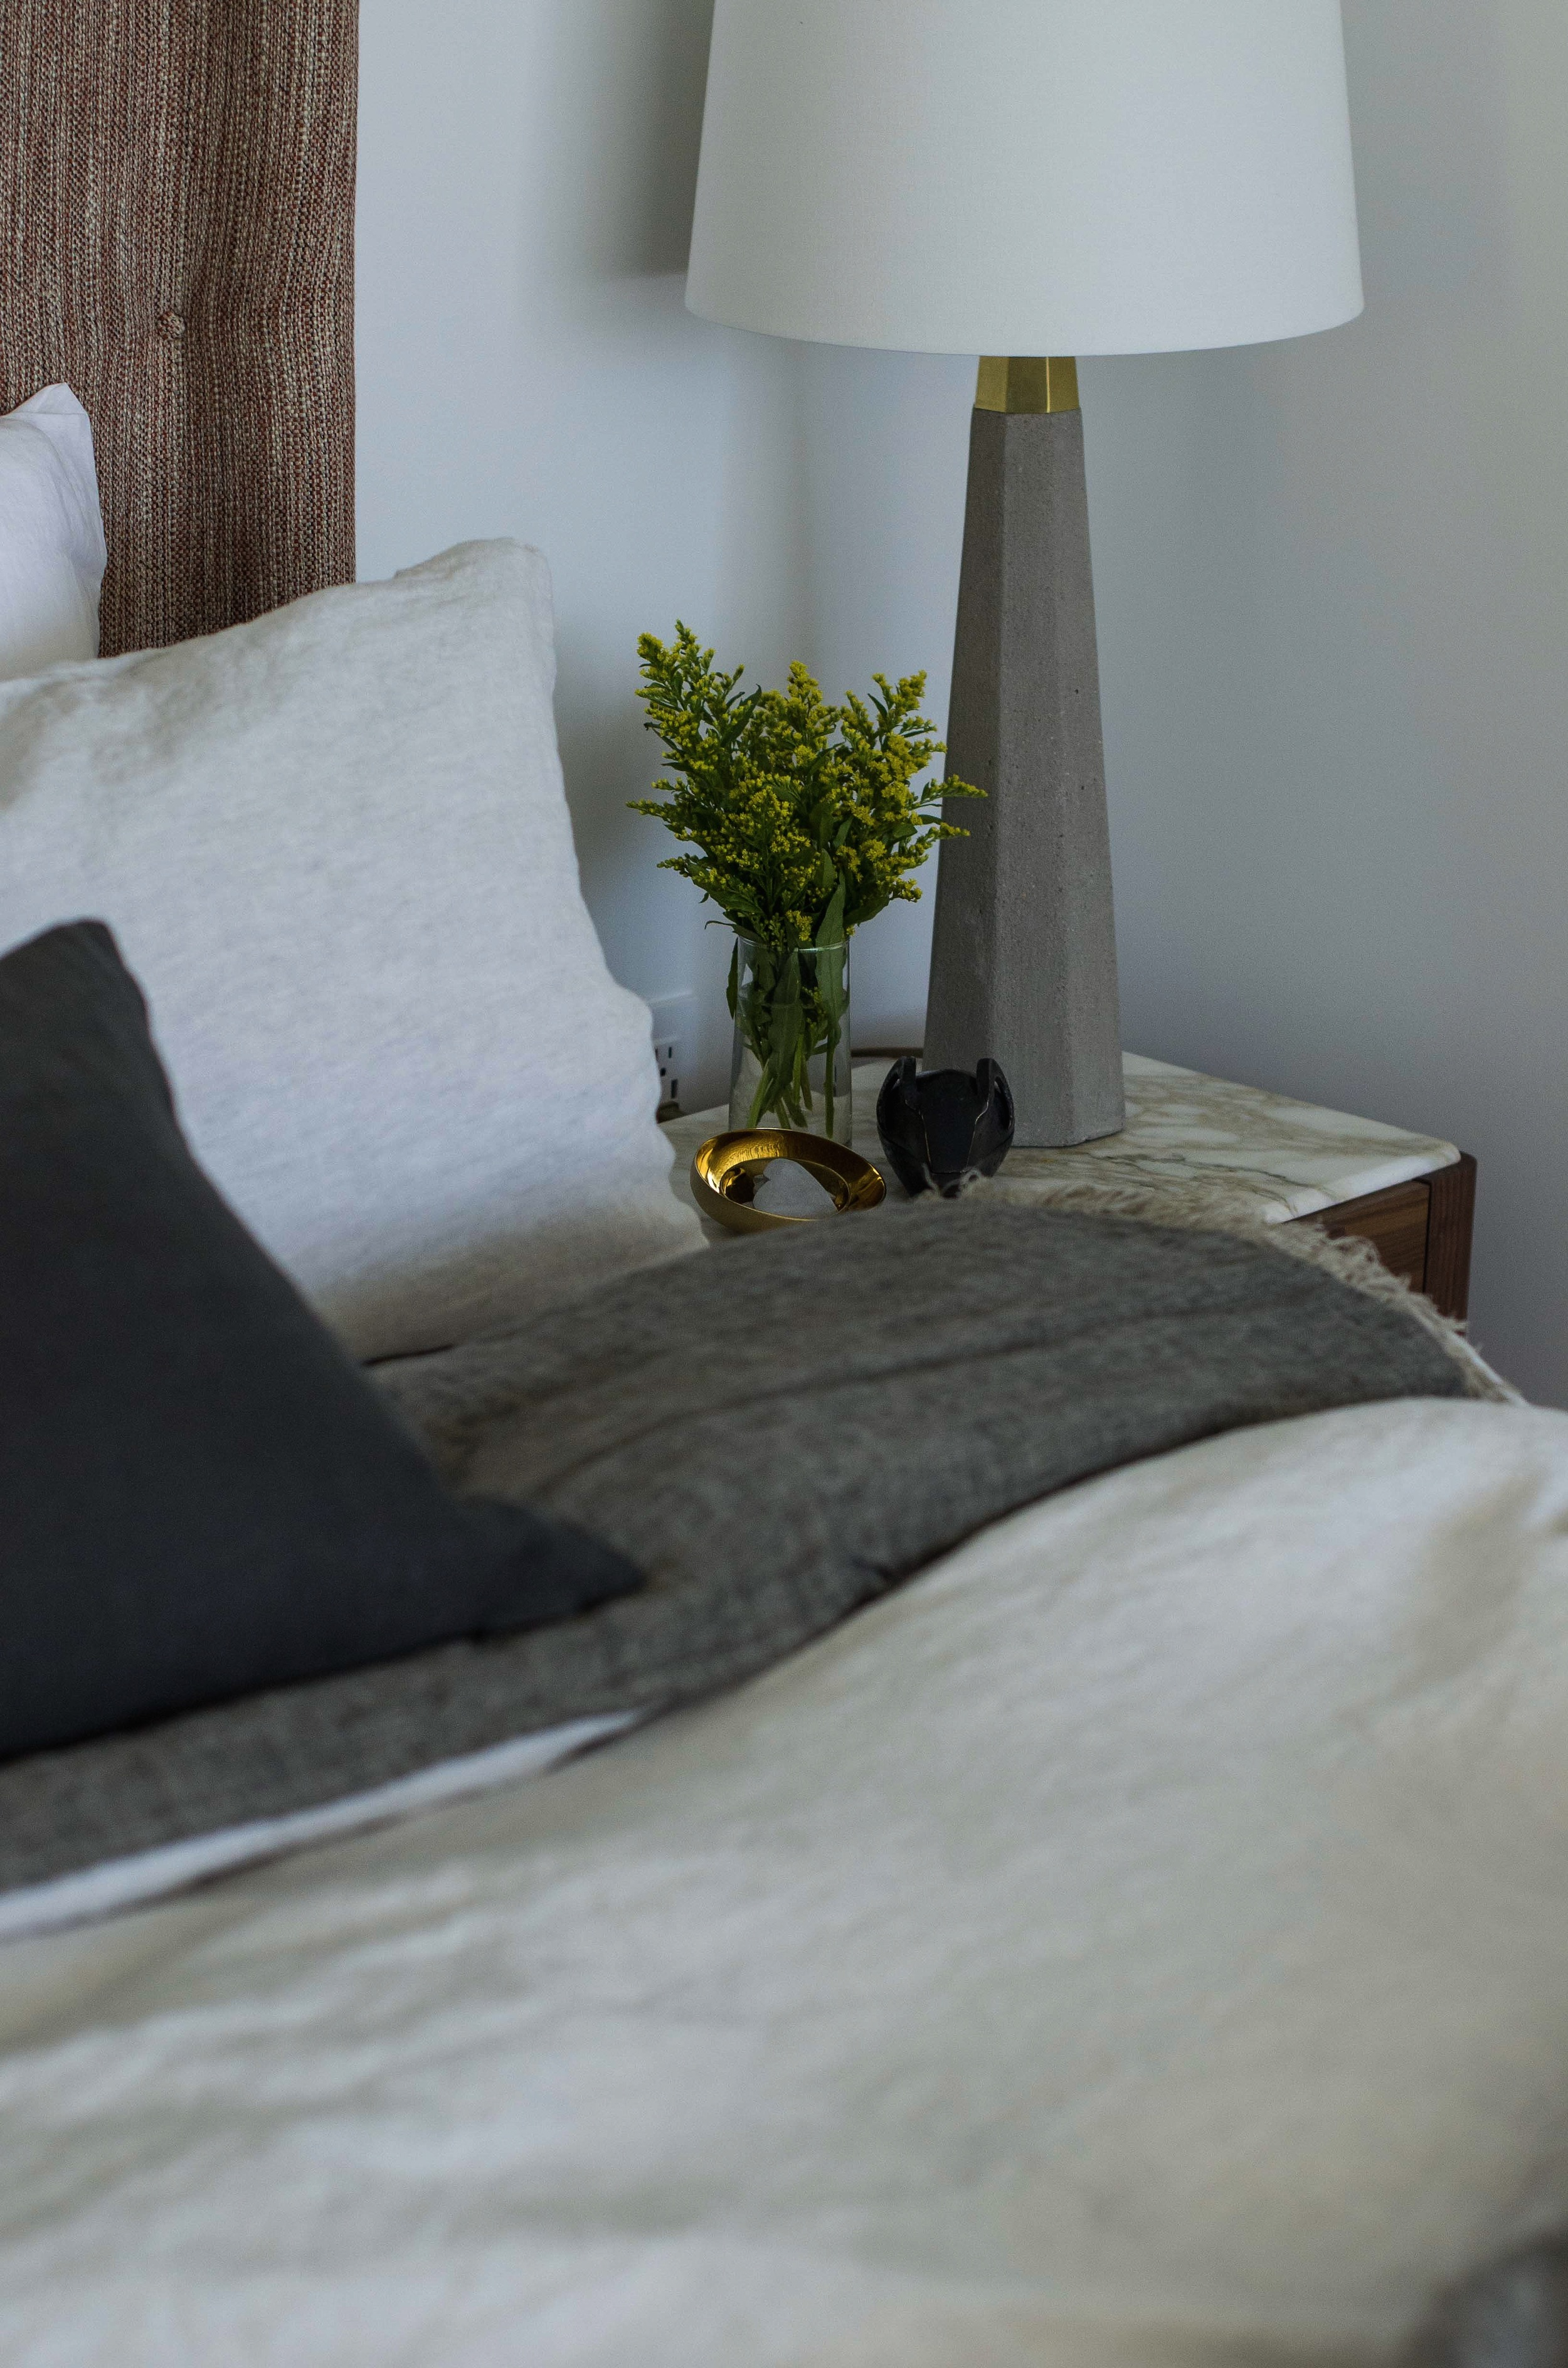 KRC_Spyglass_Master_Bedroom_Linen_Bedding.JPG